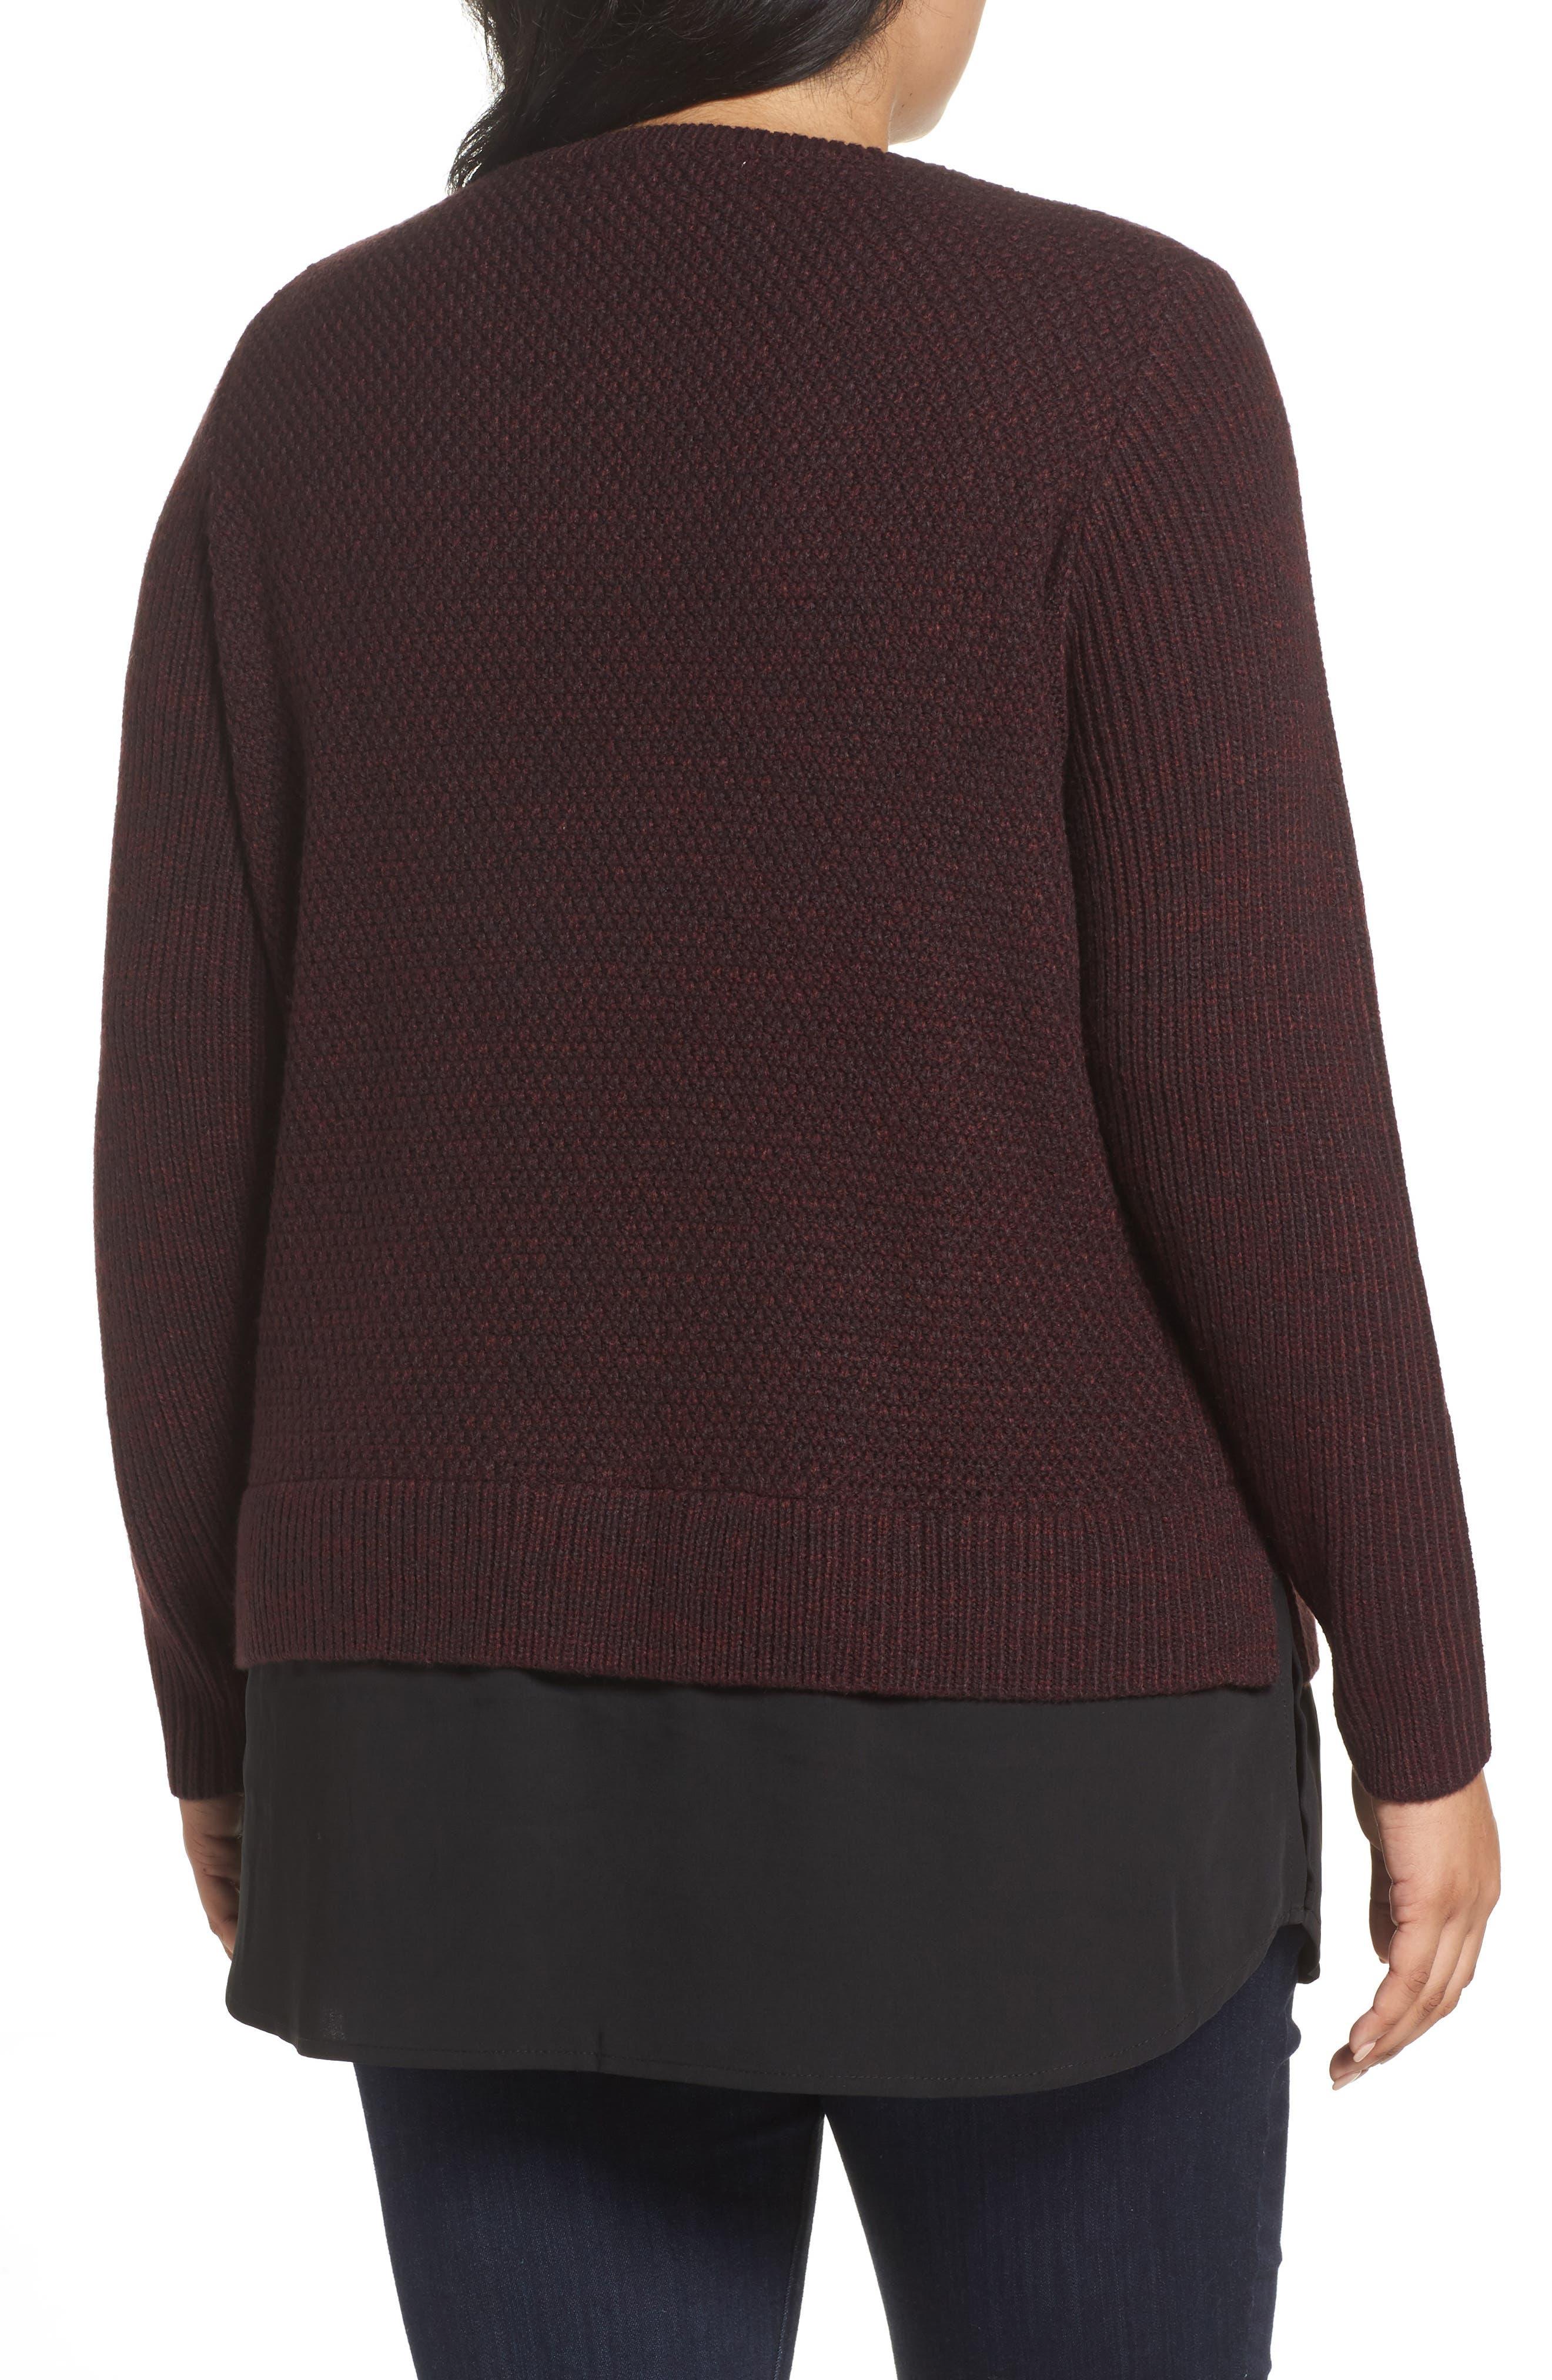 Sophia Layered Look Sweater,                             Alternate thumbnail 2, color,                             606